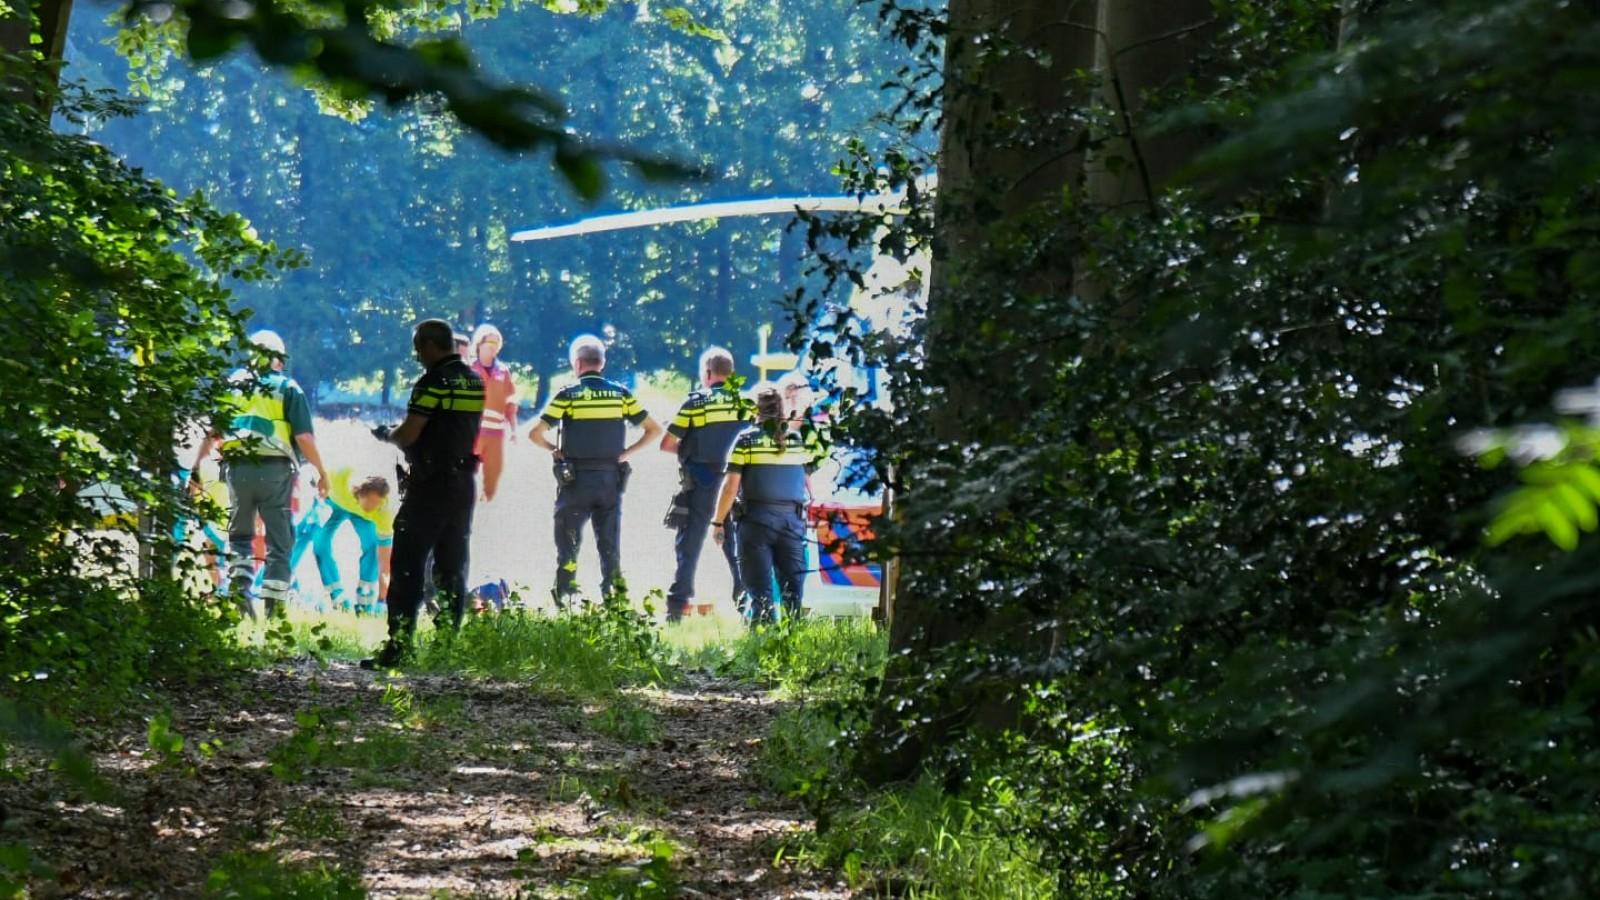 Hilversumse politie schiet verdachte neer na 'ernstig incident'